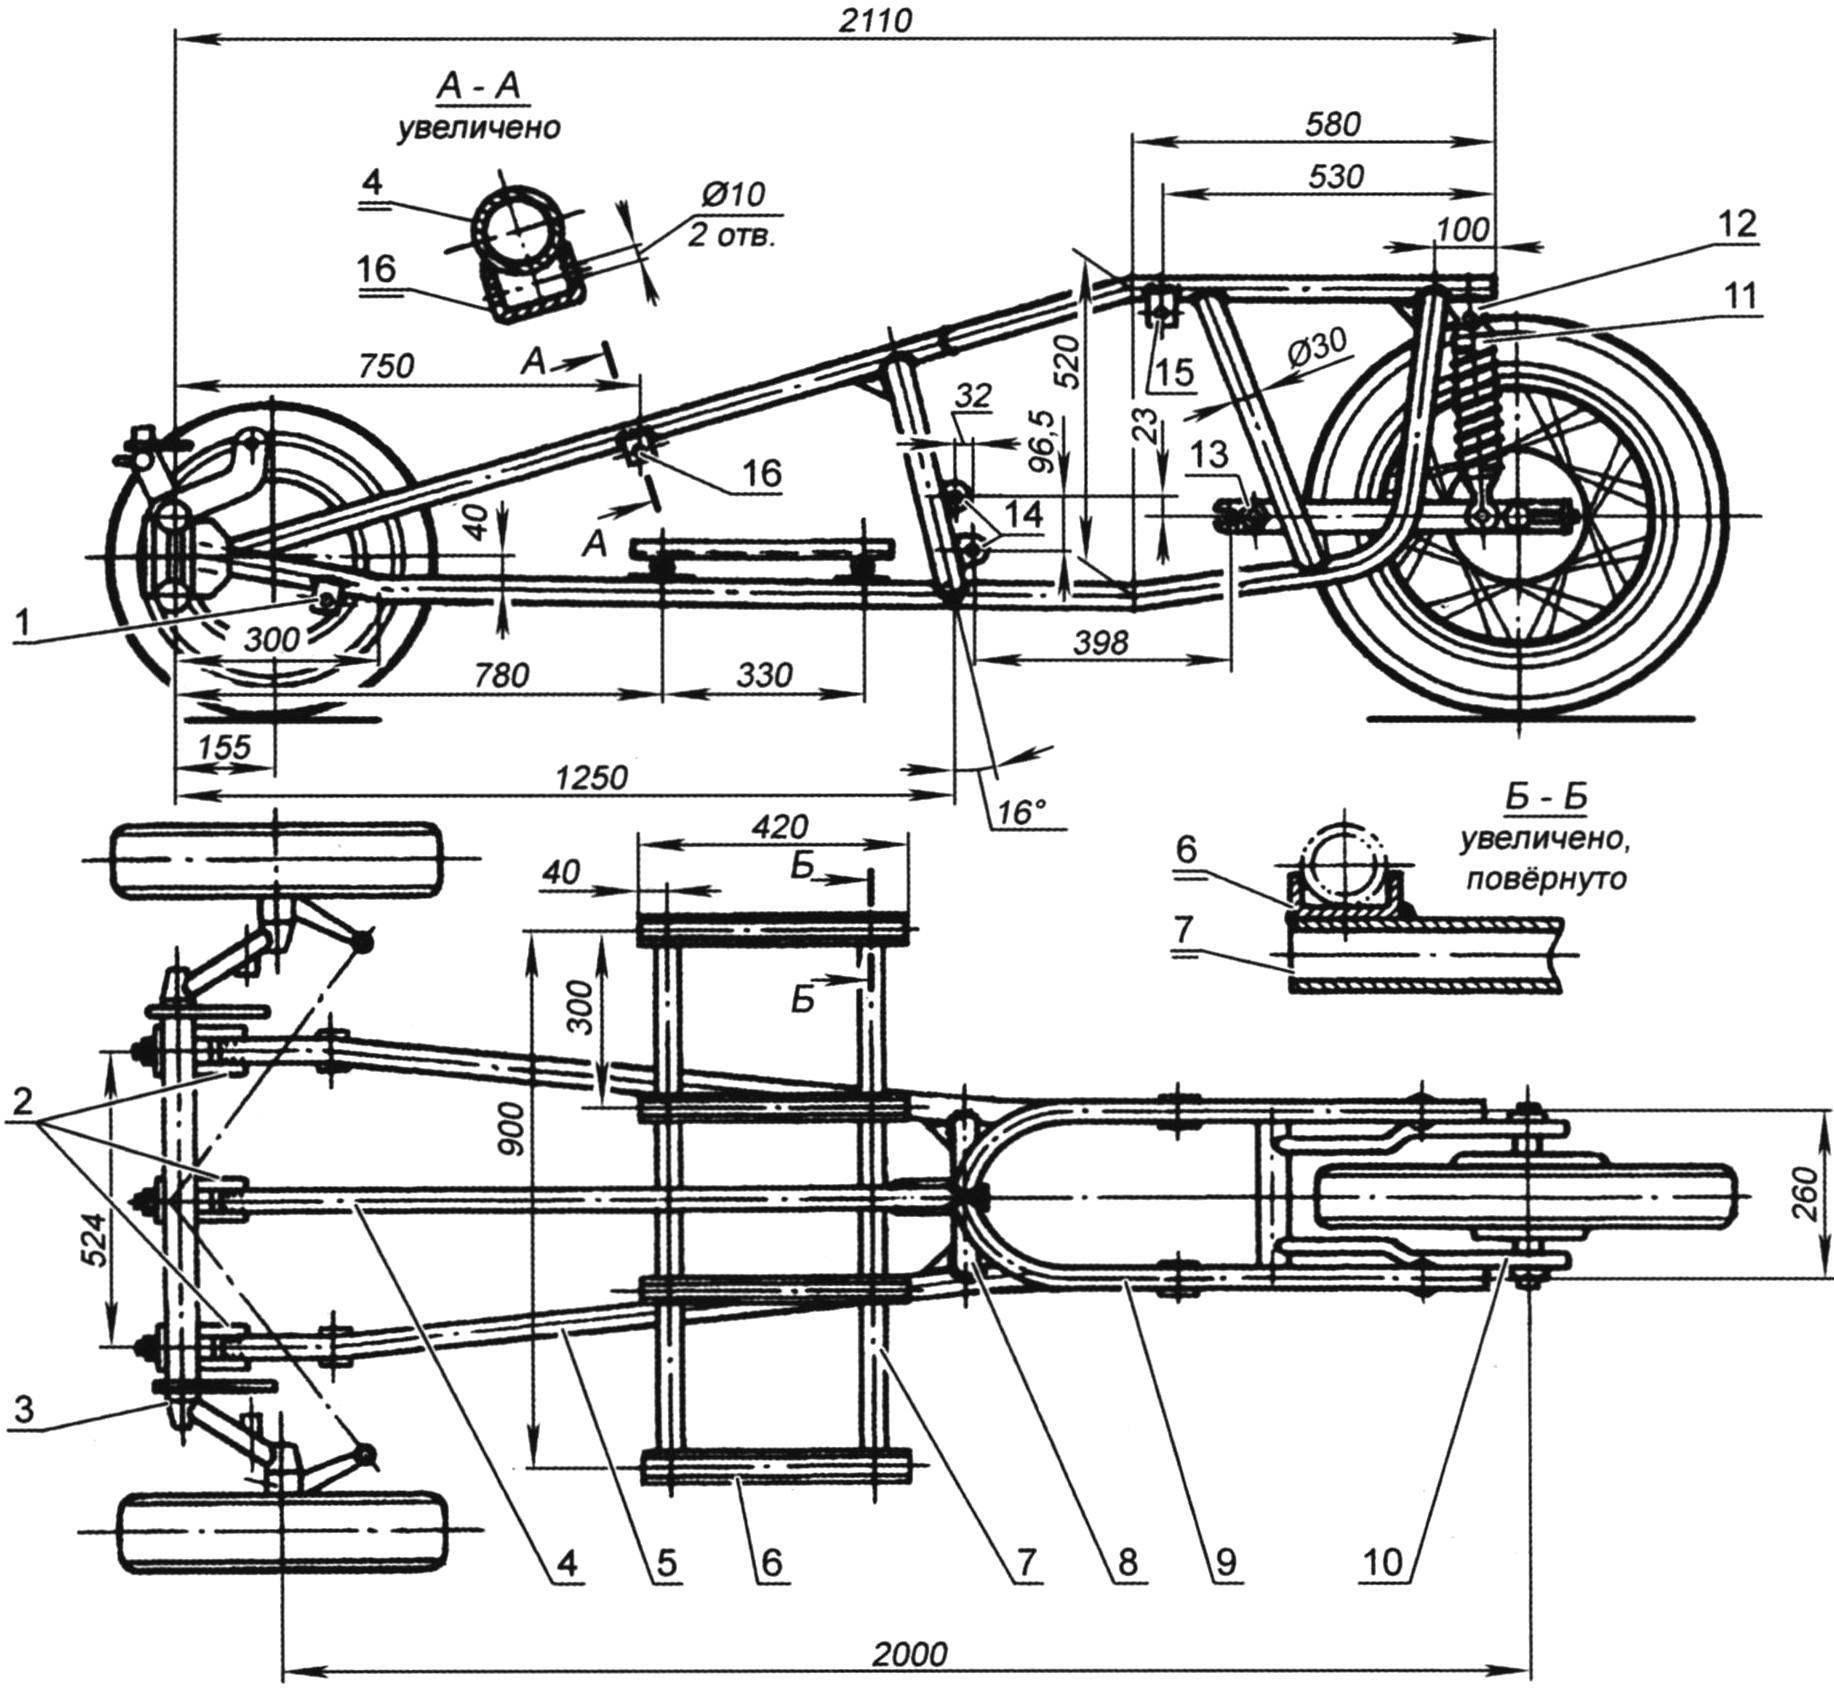 Шасси трицикла